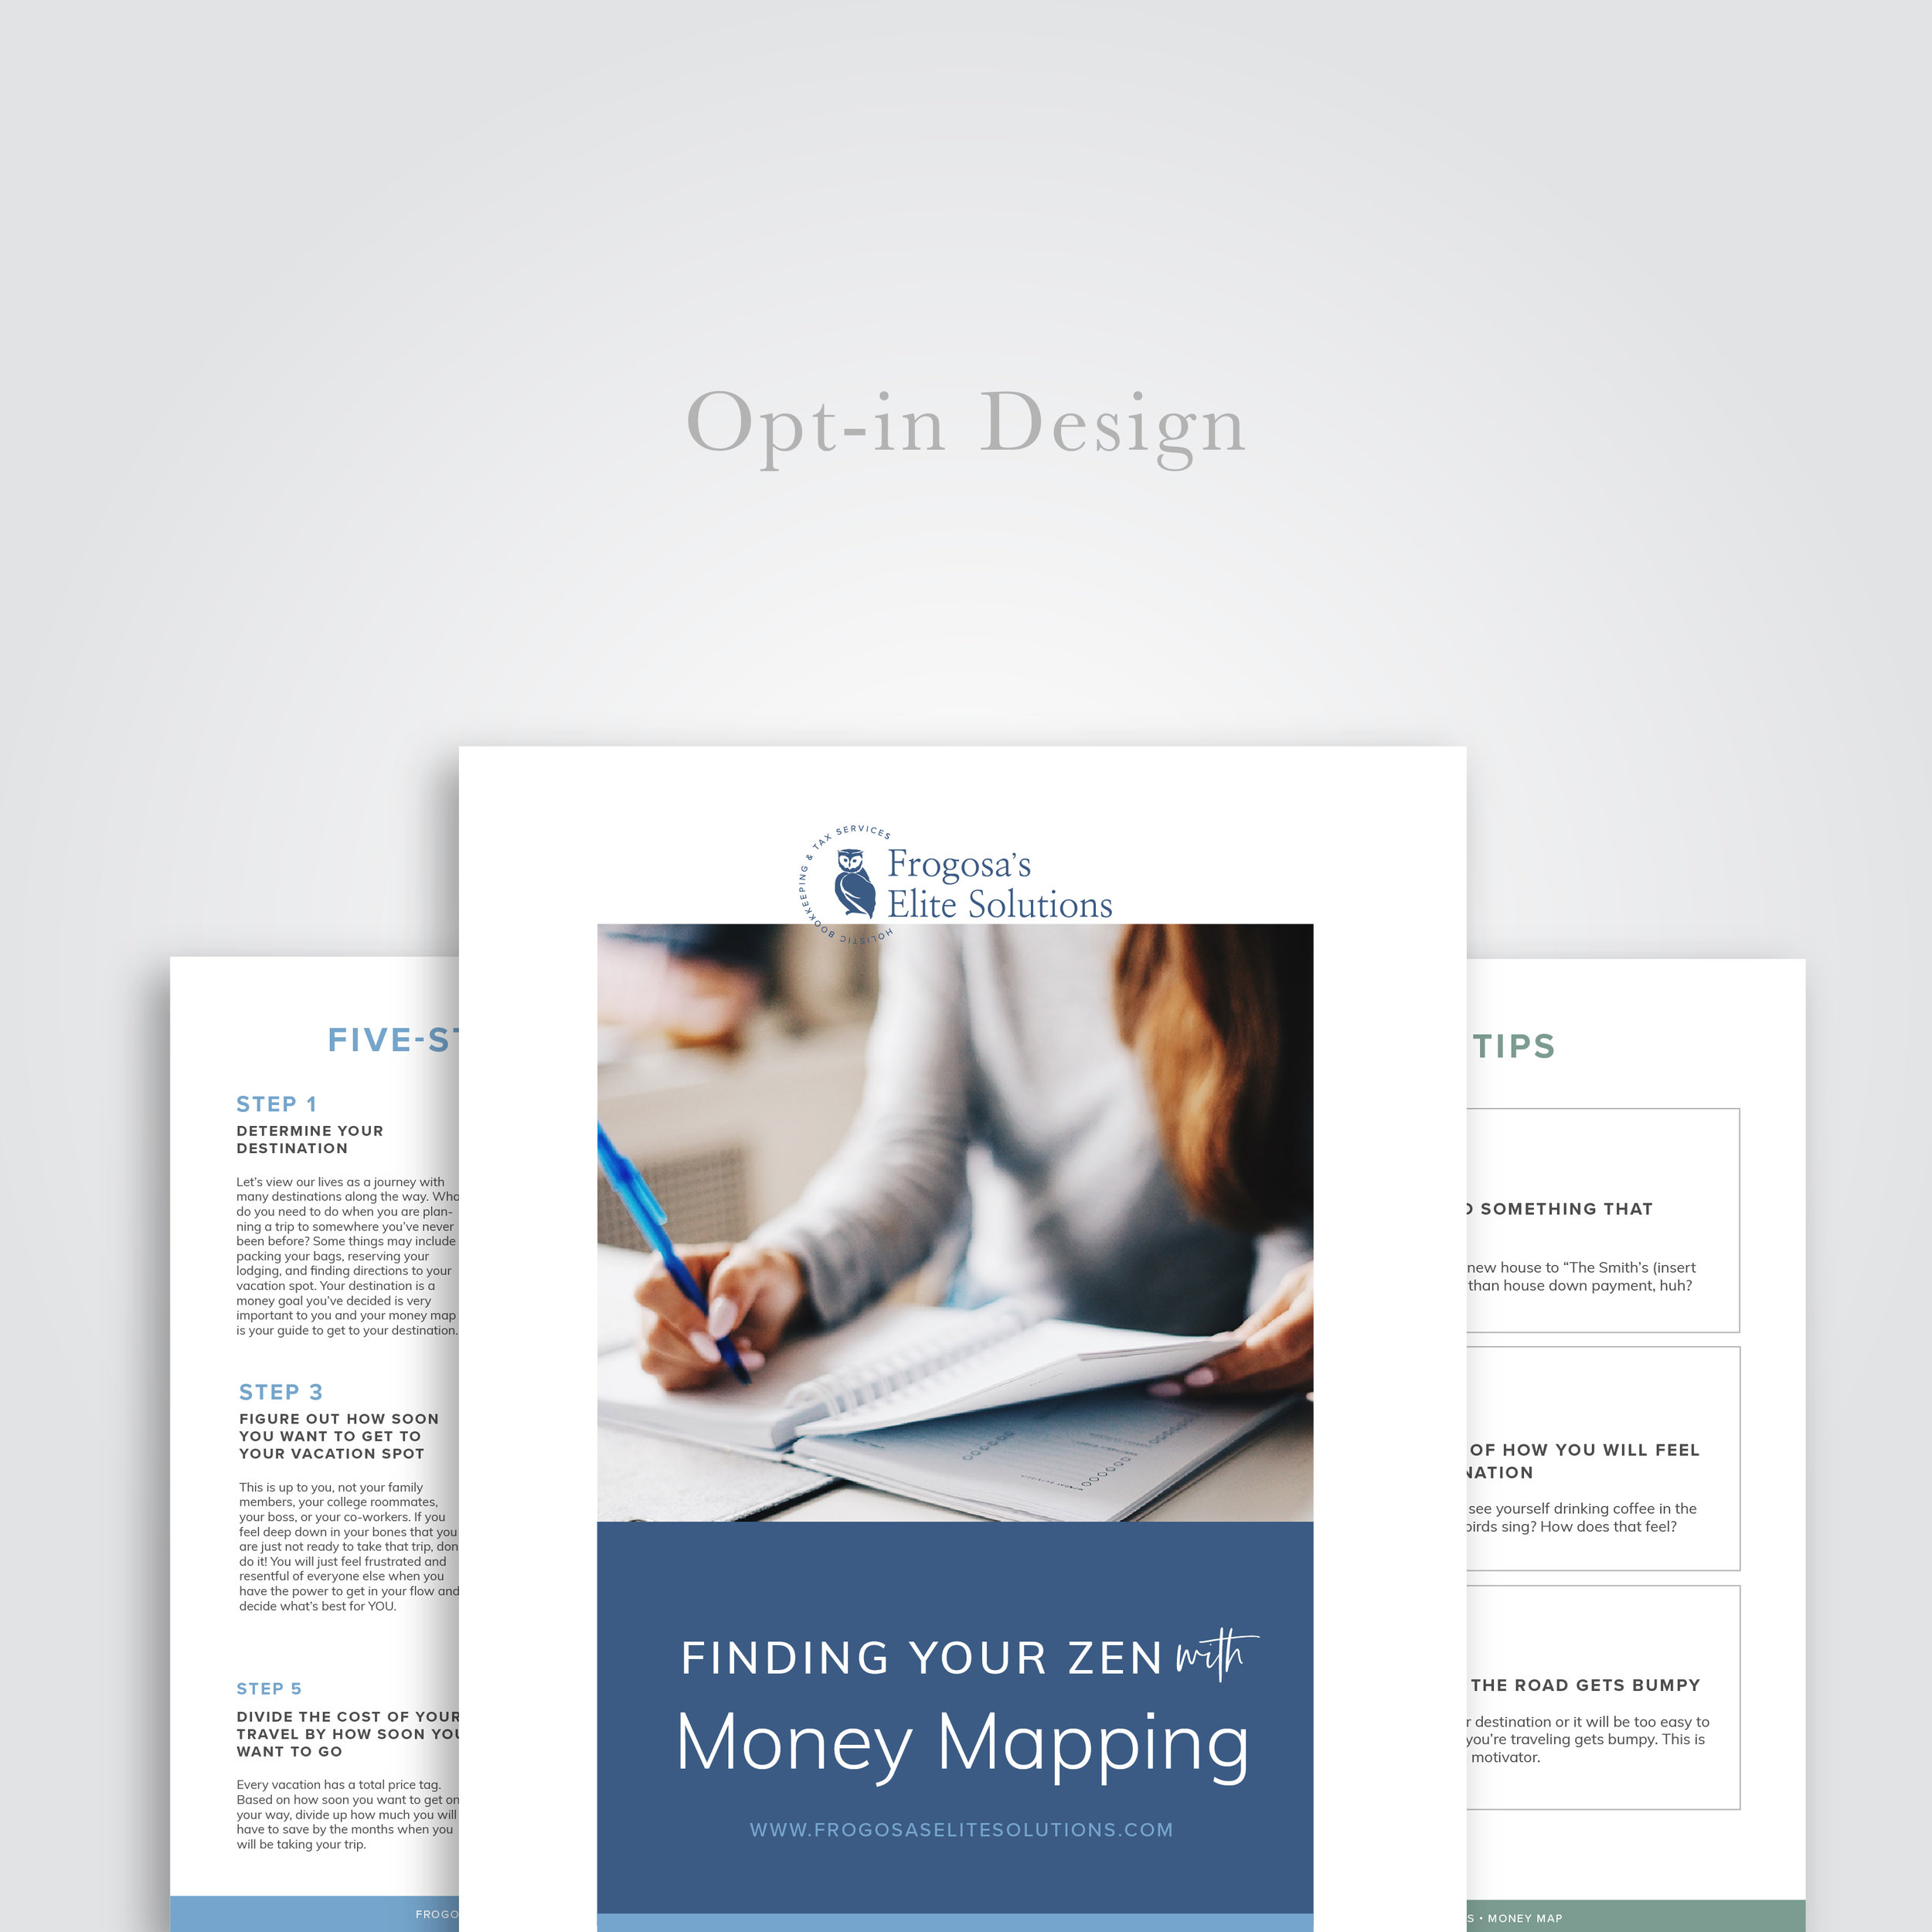 IG-FES-opt-in-design.jpg